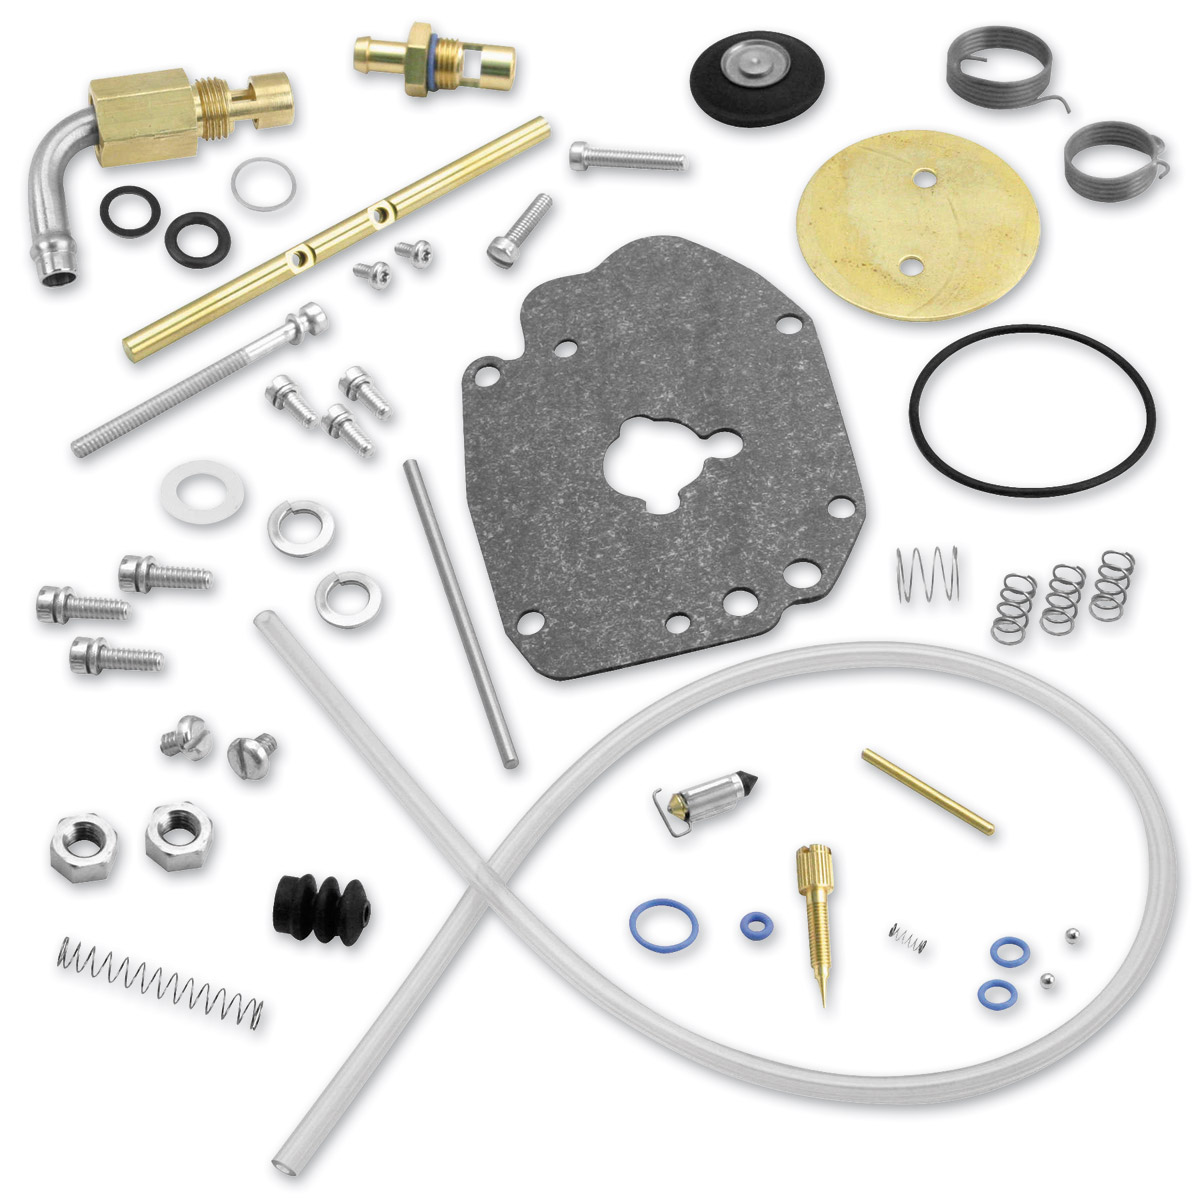 hight resolution of s s super e master rebuild kit